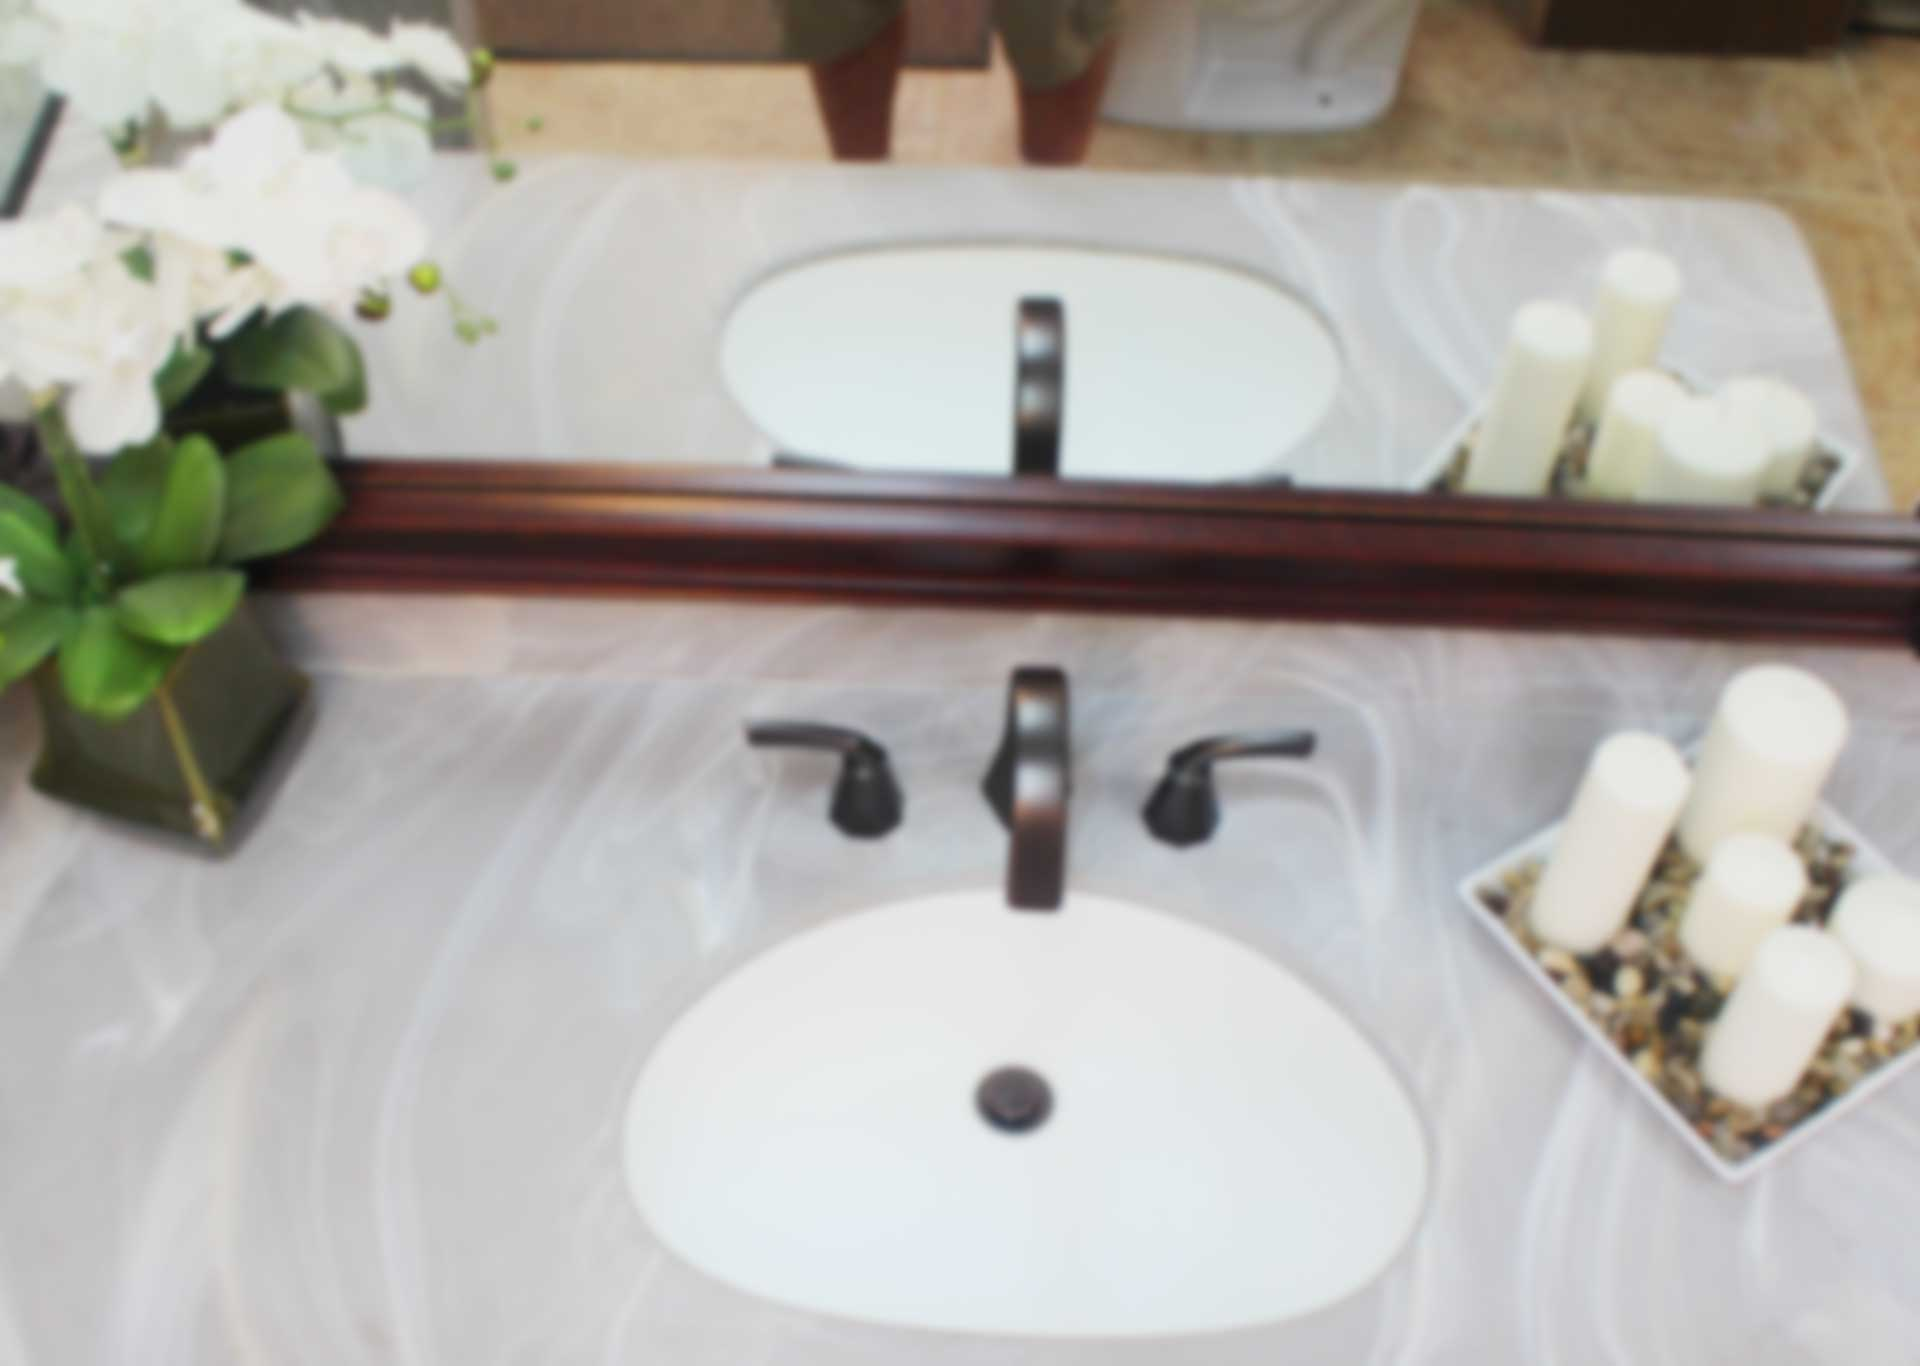 Stunning Jetta Bathtubs Images - The Best Bathroom Ideas - lapoup.com